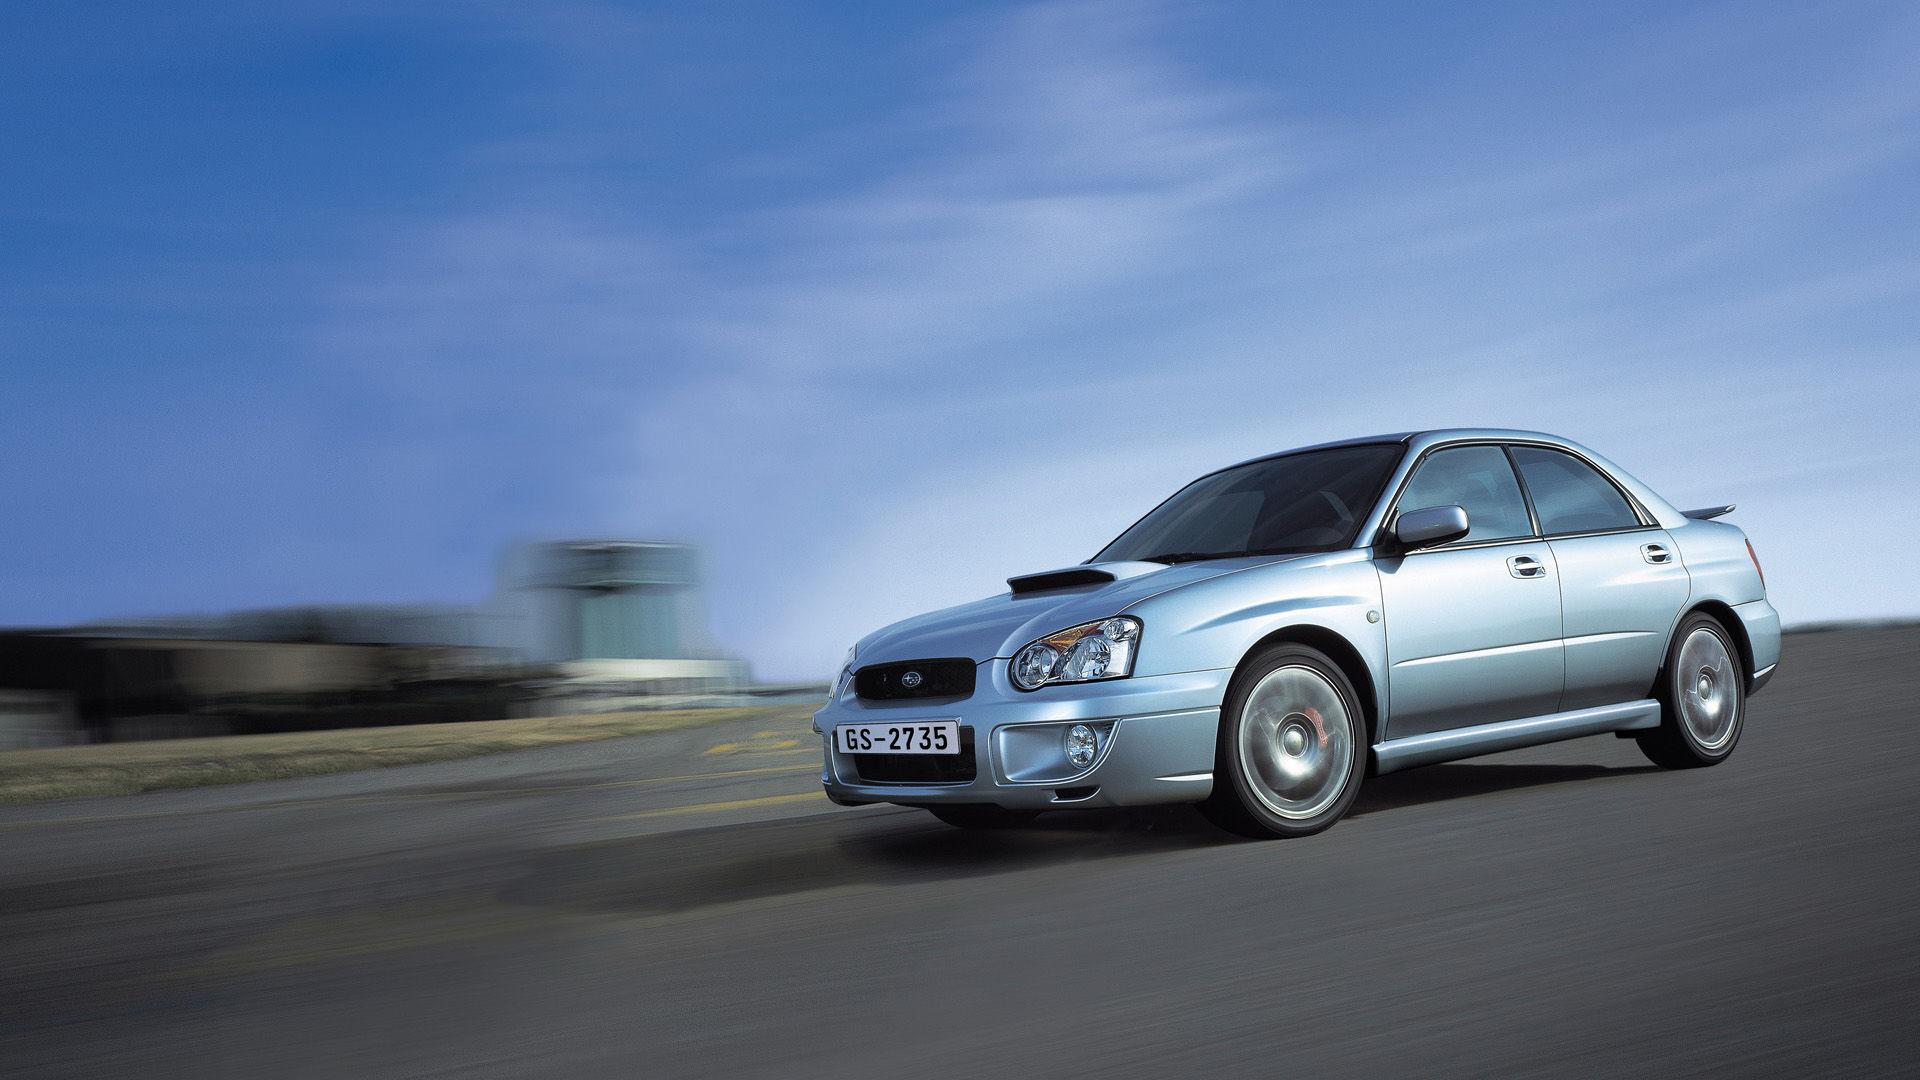 2004 Subaru Impreza WRX